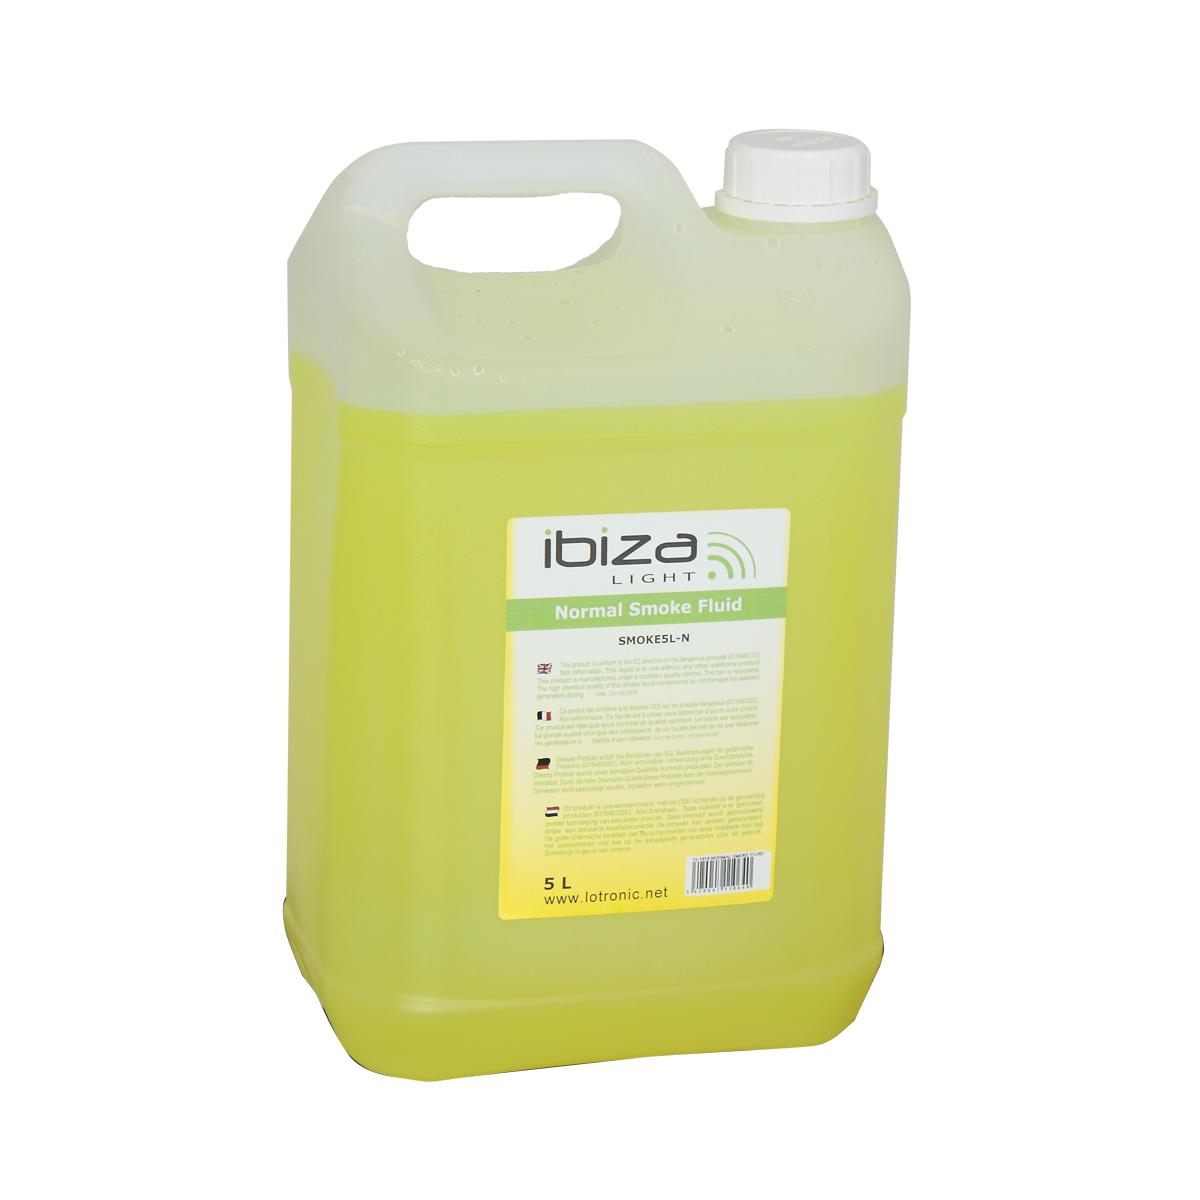 Ibiza Light Liquide fumée light 5 litres - SMOKE5L-N